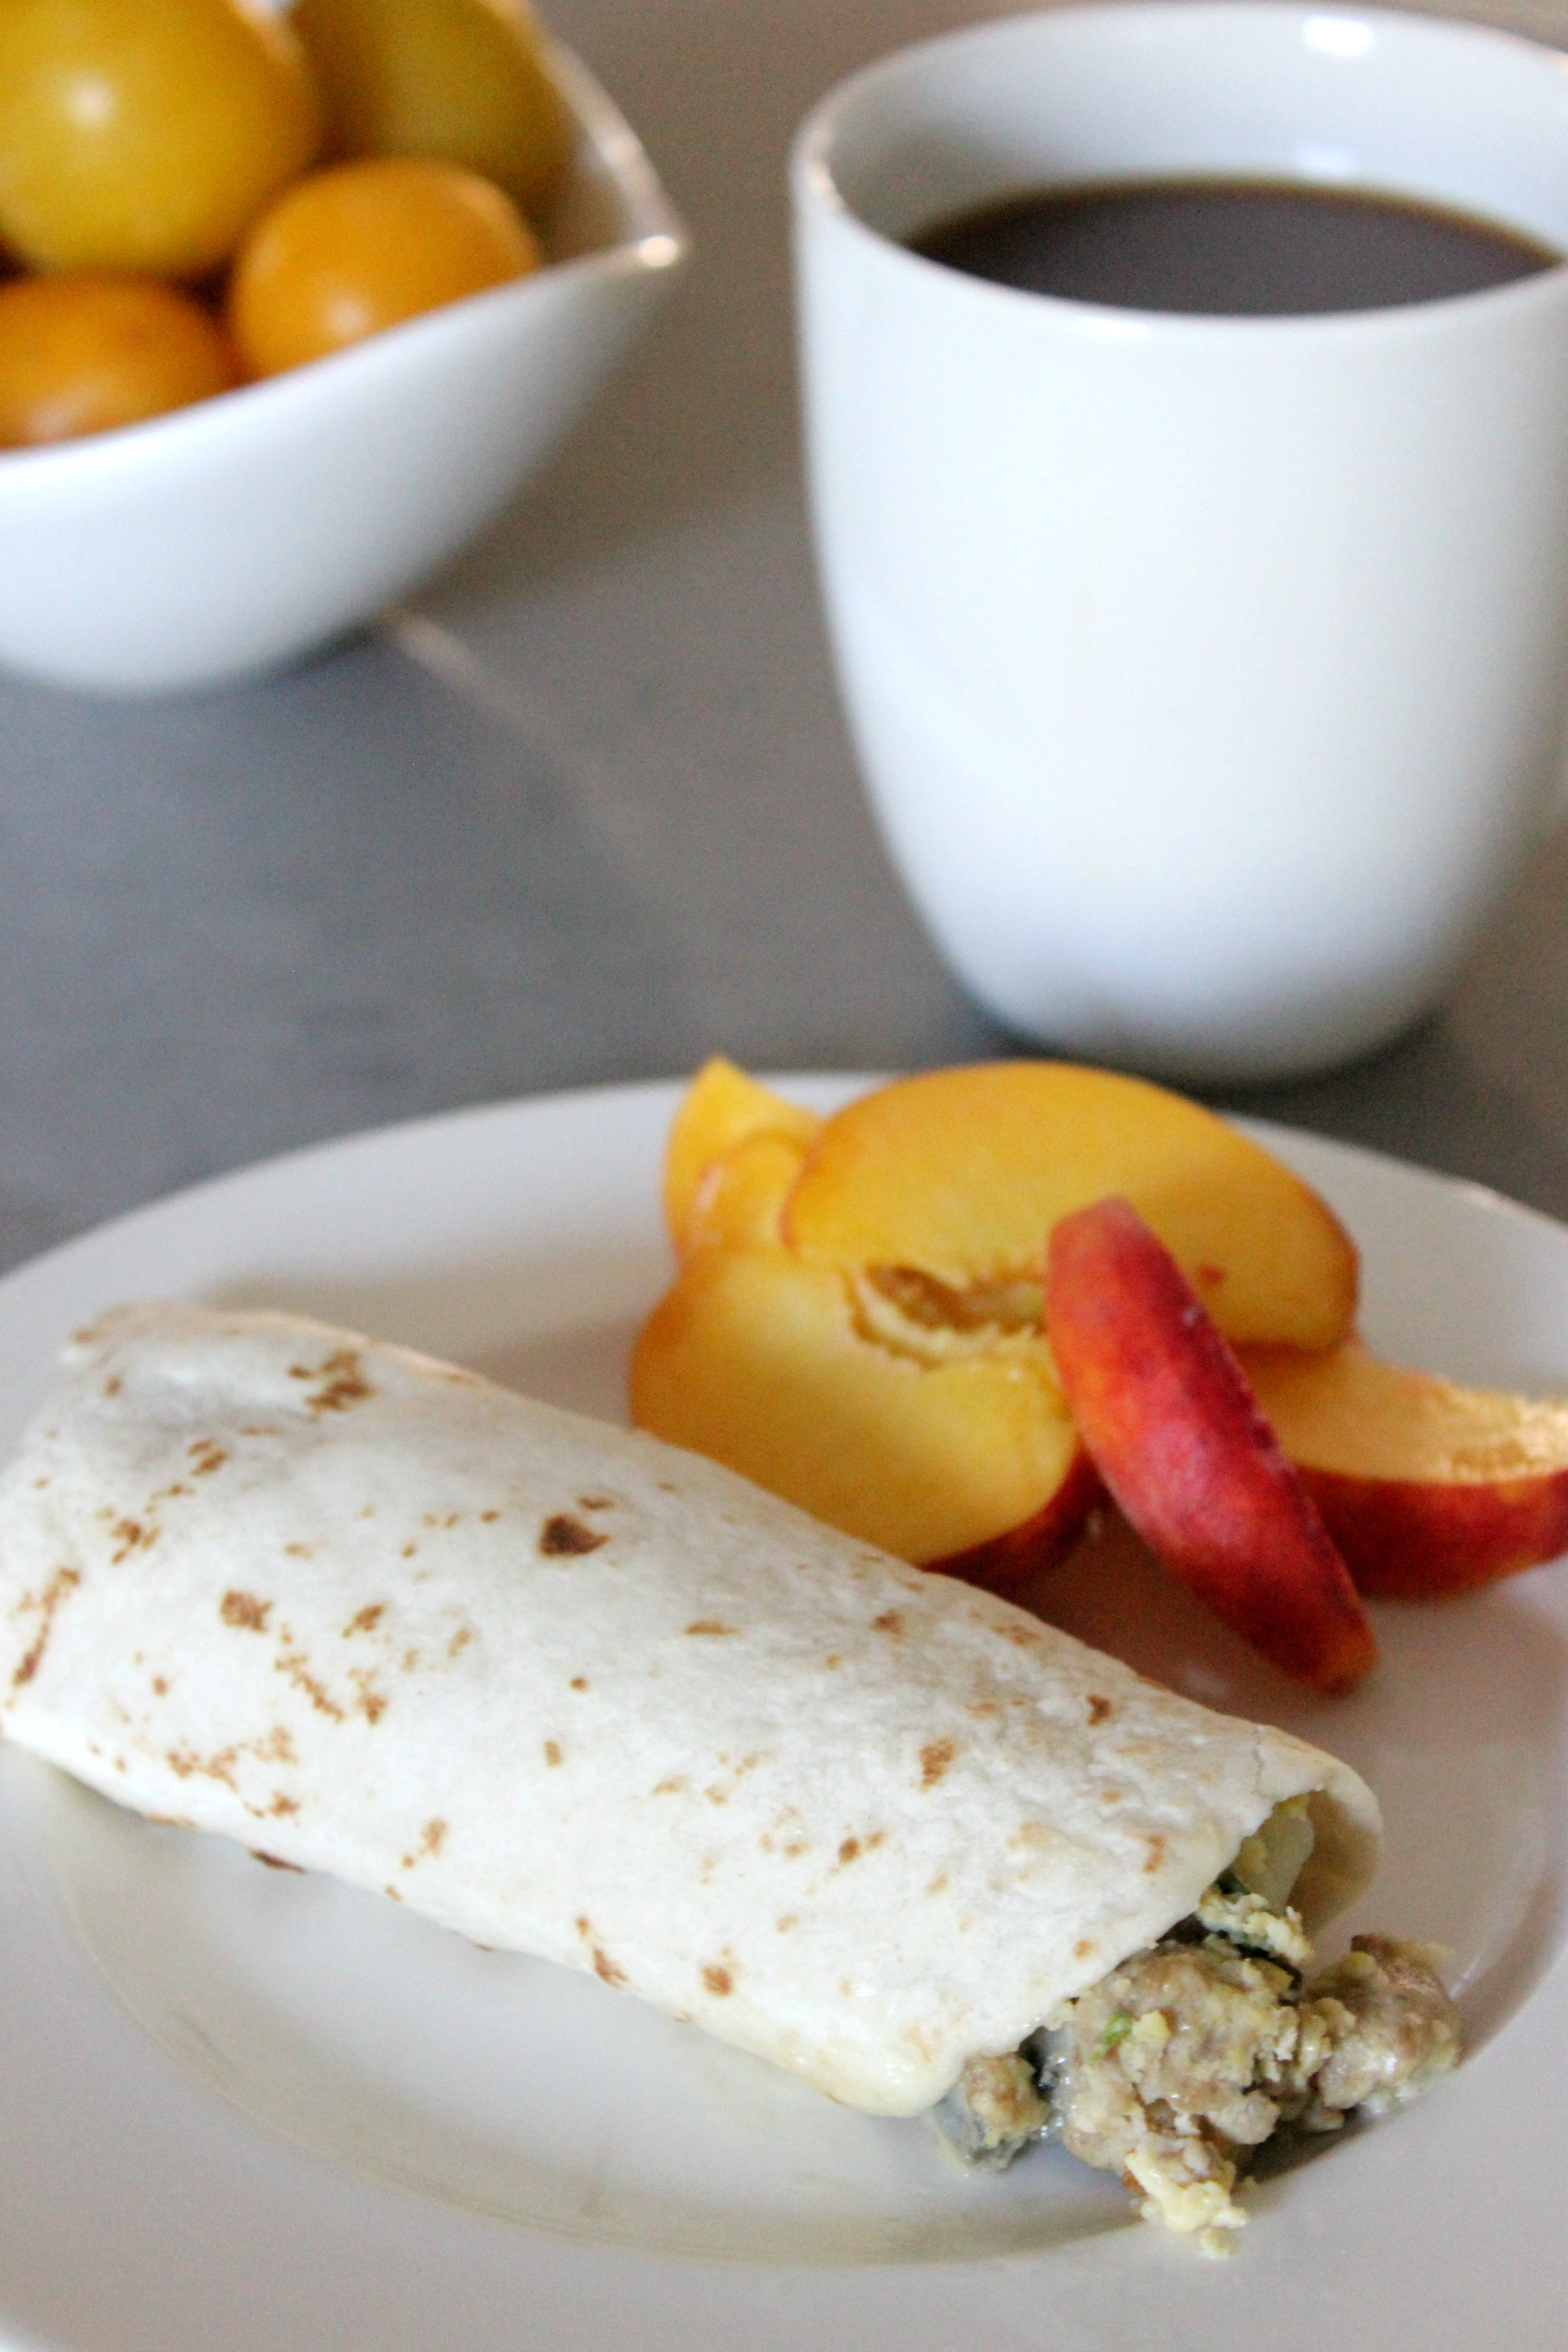 Make Ahead Breakfast Burrito Recipes  5 Make Ahead Breakfast Burrito Recipes SoFabFood